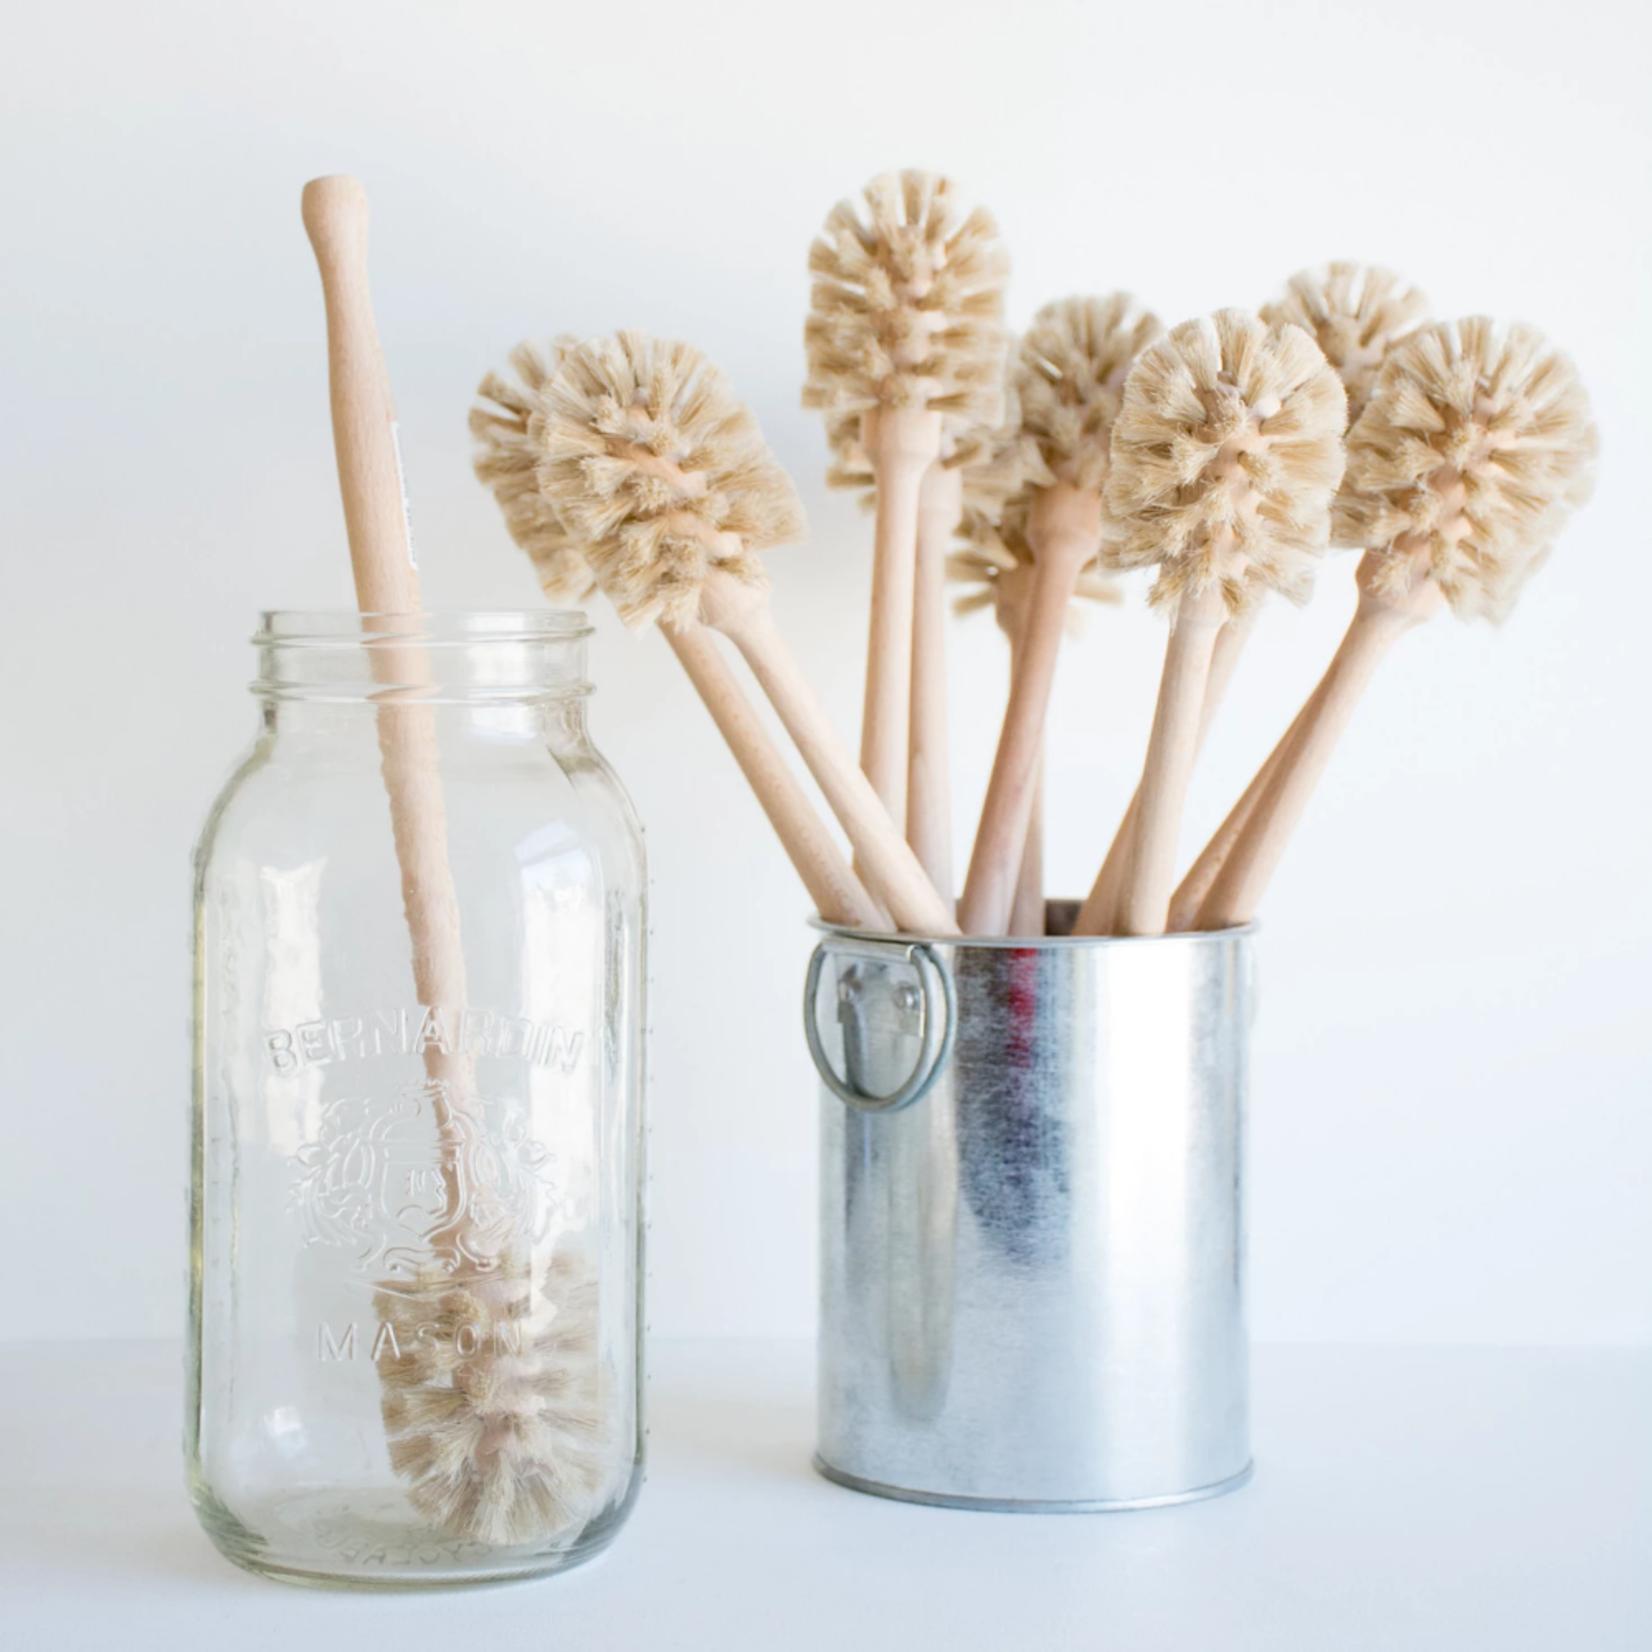 Redecker Untreated Beechwood Bottle Brushes